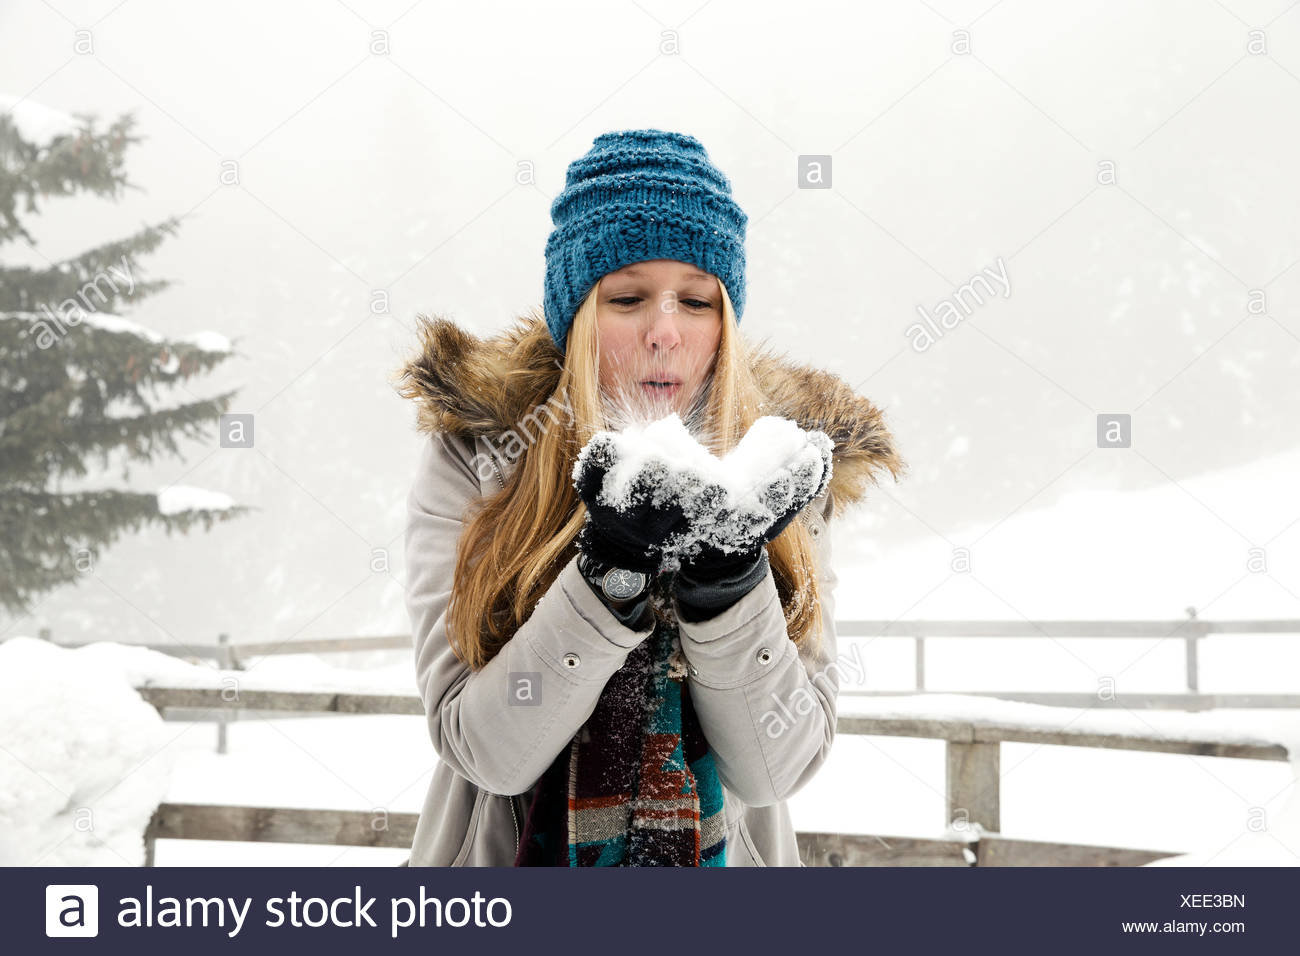 92b074c4c8db5 Person Blowing Snow Stock Photos   Person Blowing Snow Stock Images ...